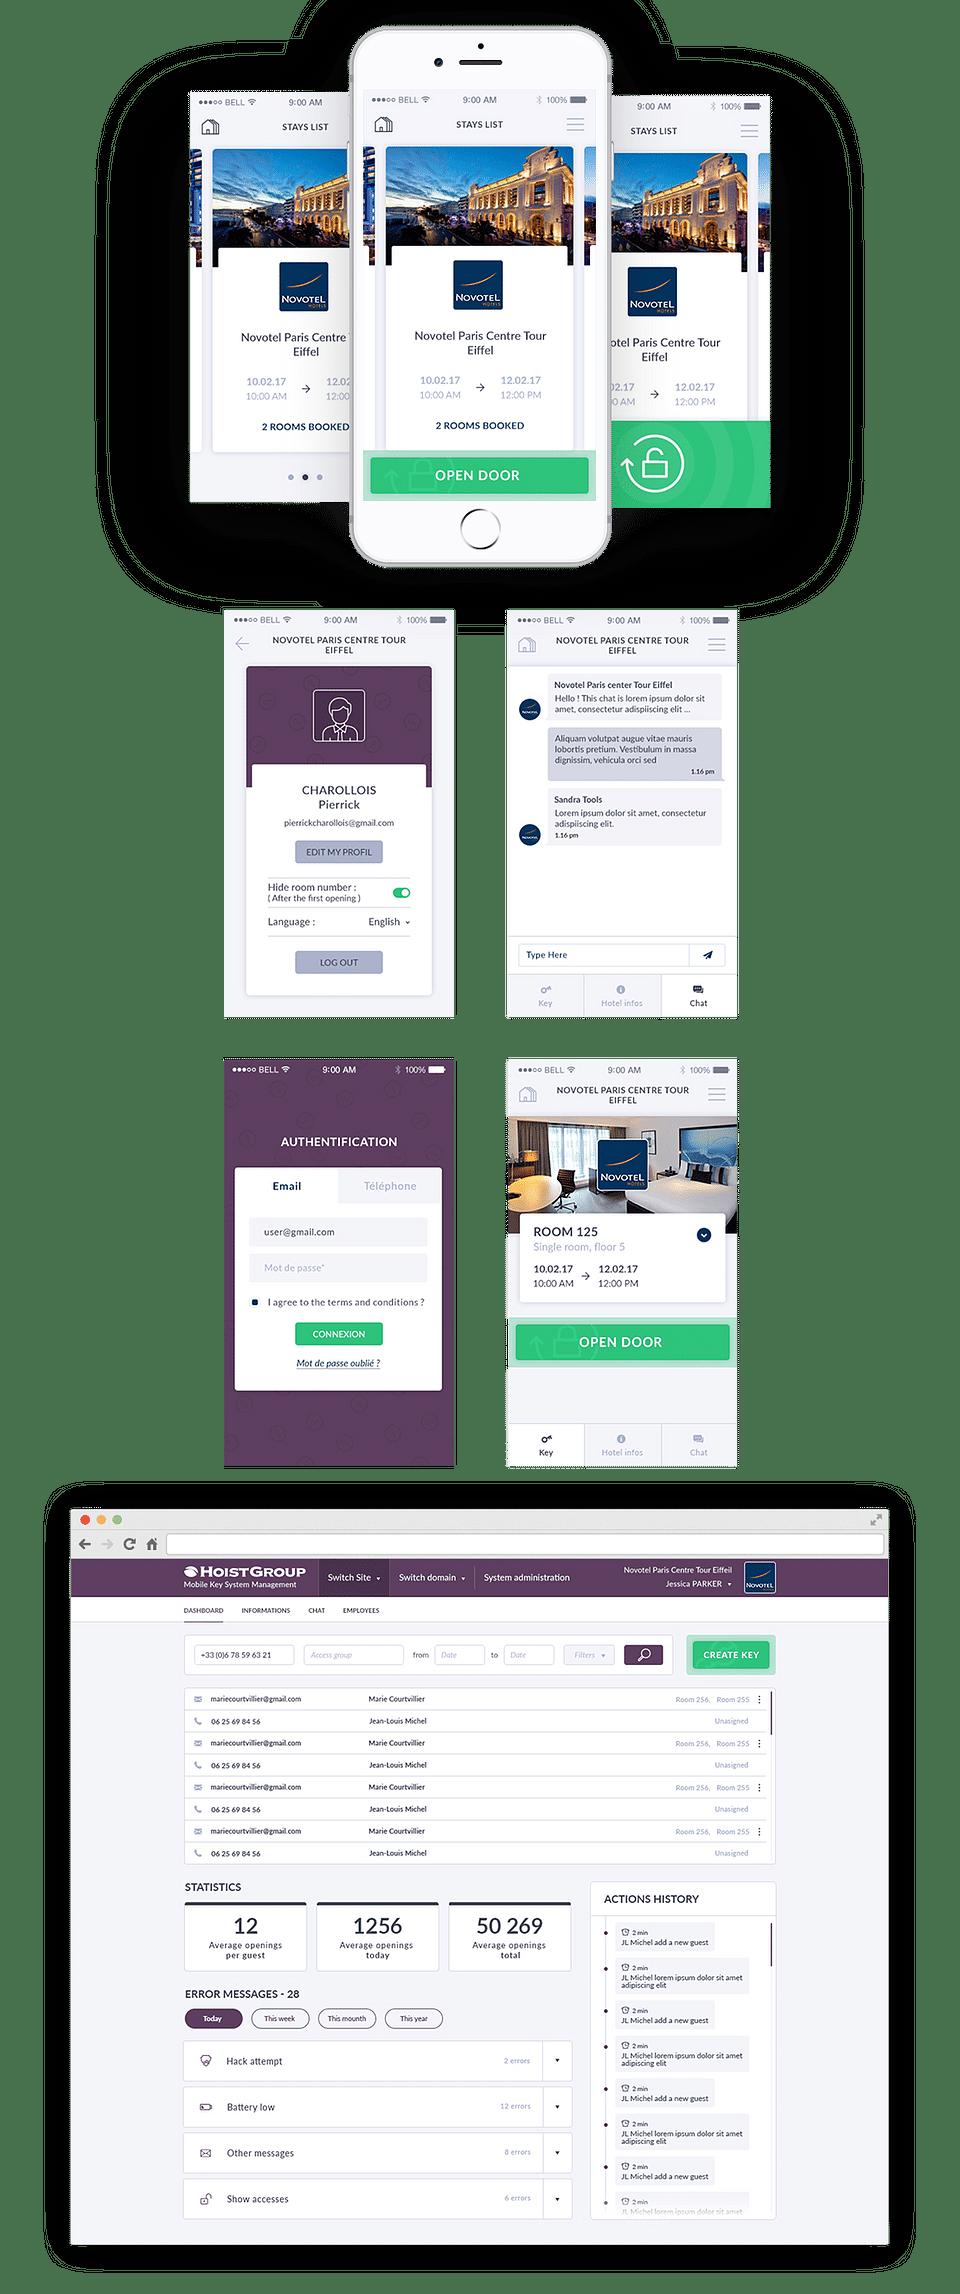 Application mobile - Hoist Group